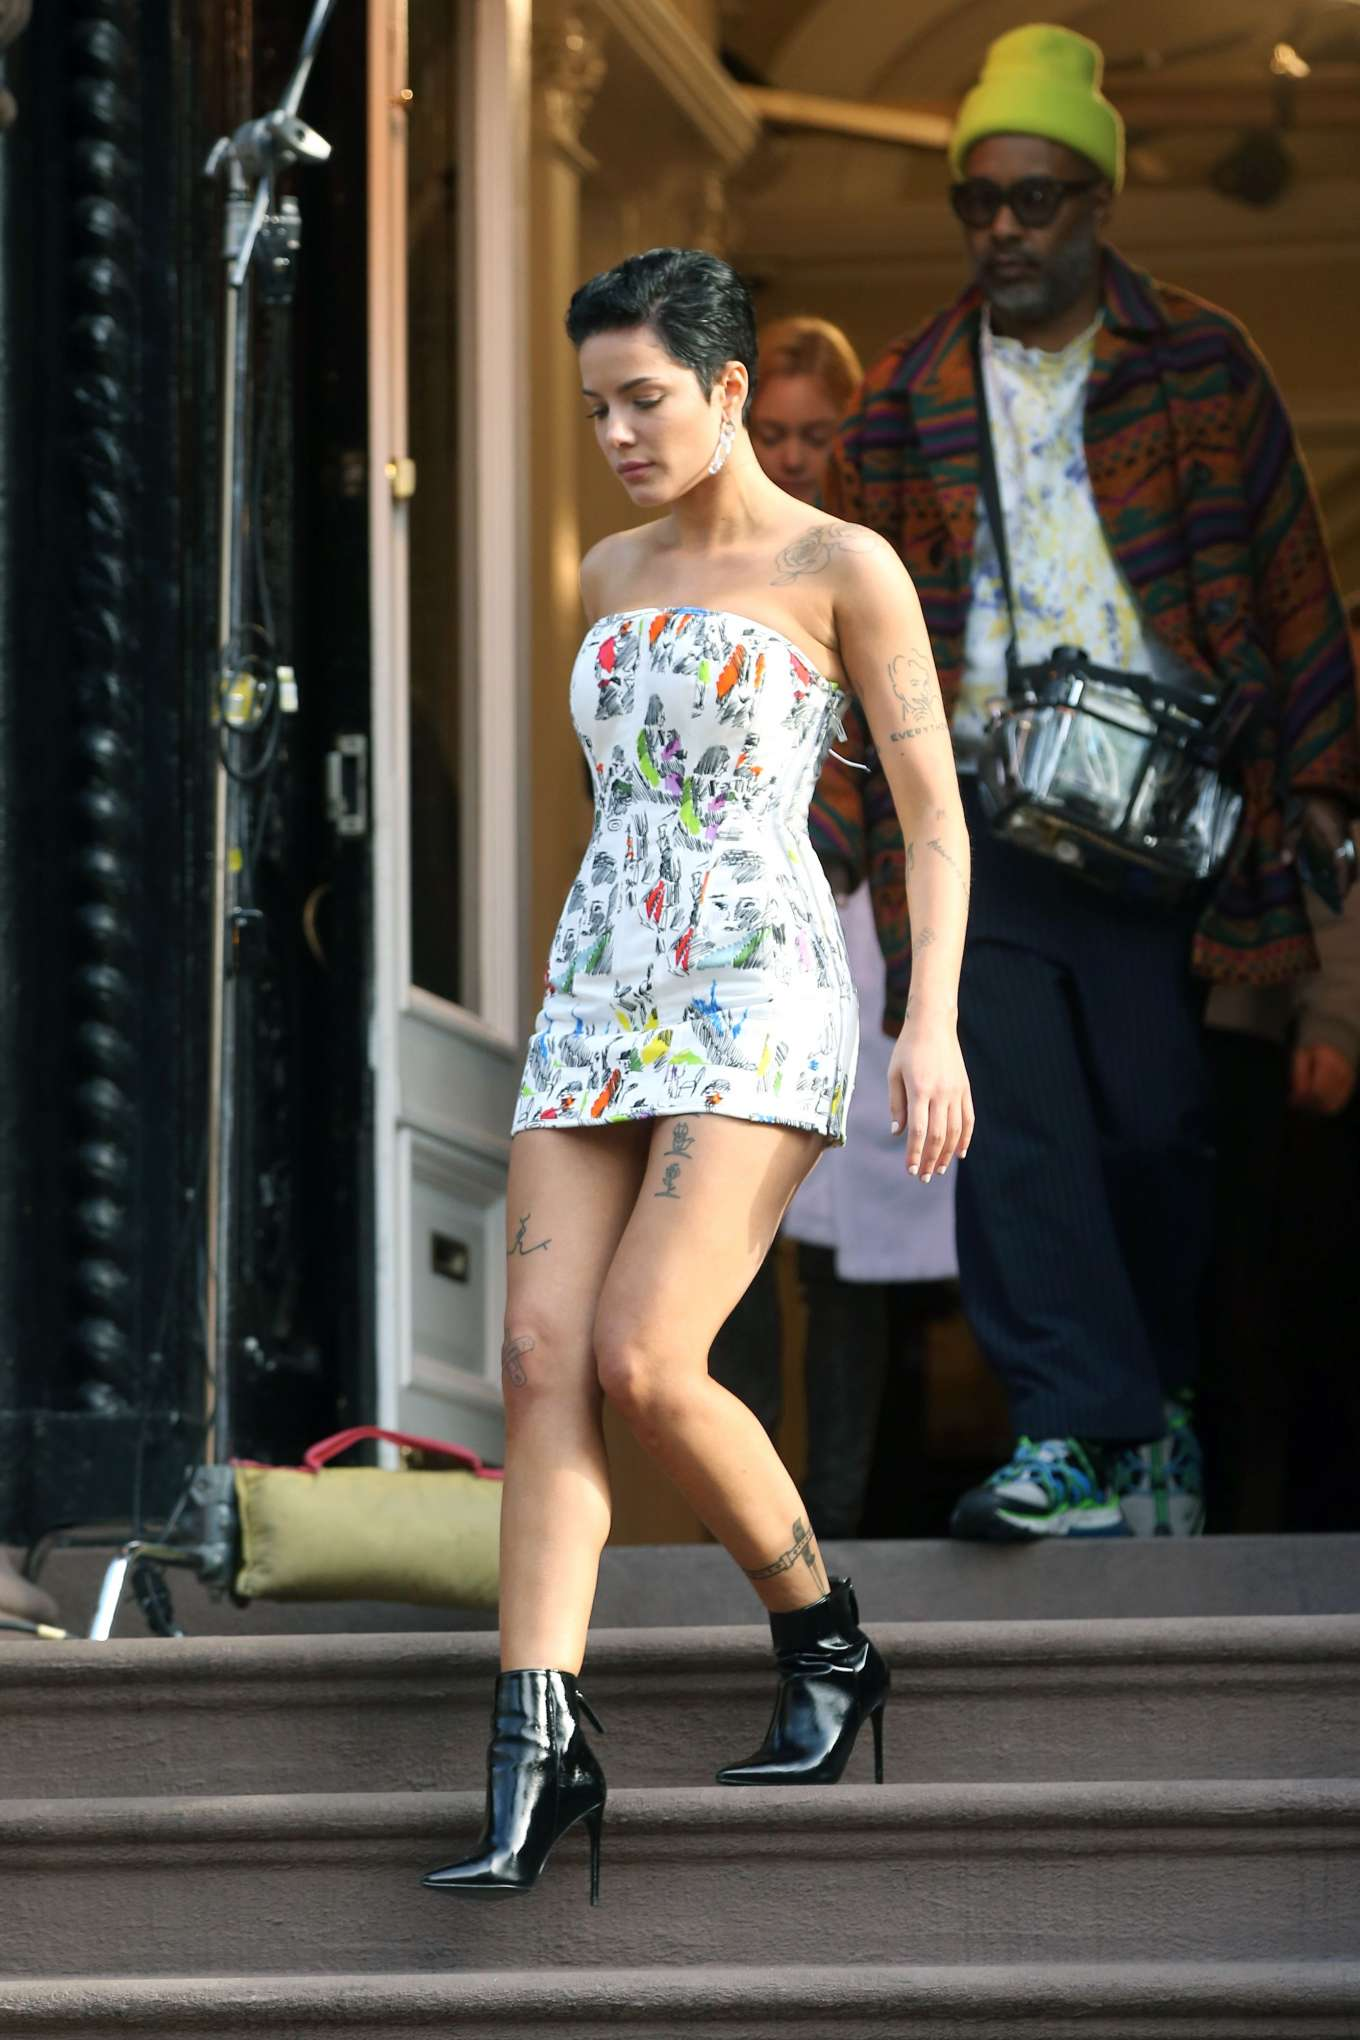 Halsey 2020 : Halsey in Mini Dress at Salmagundi Club in New York City-14